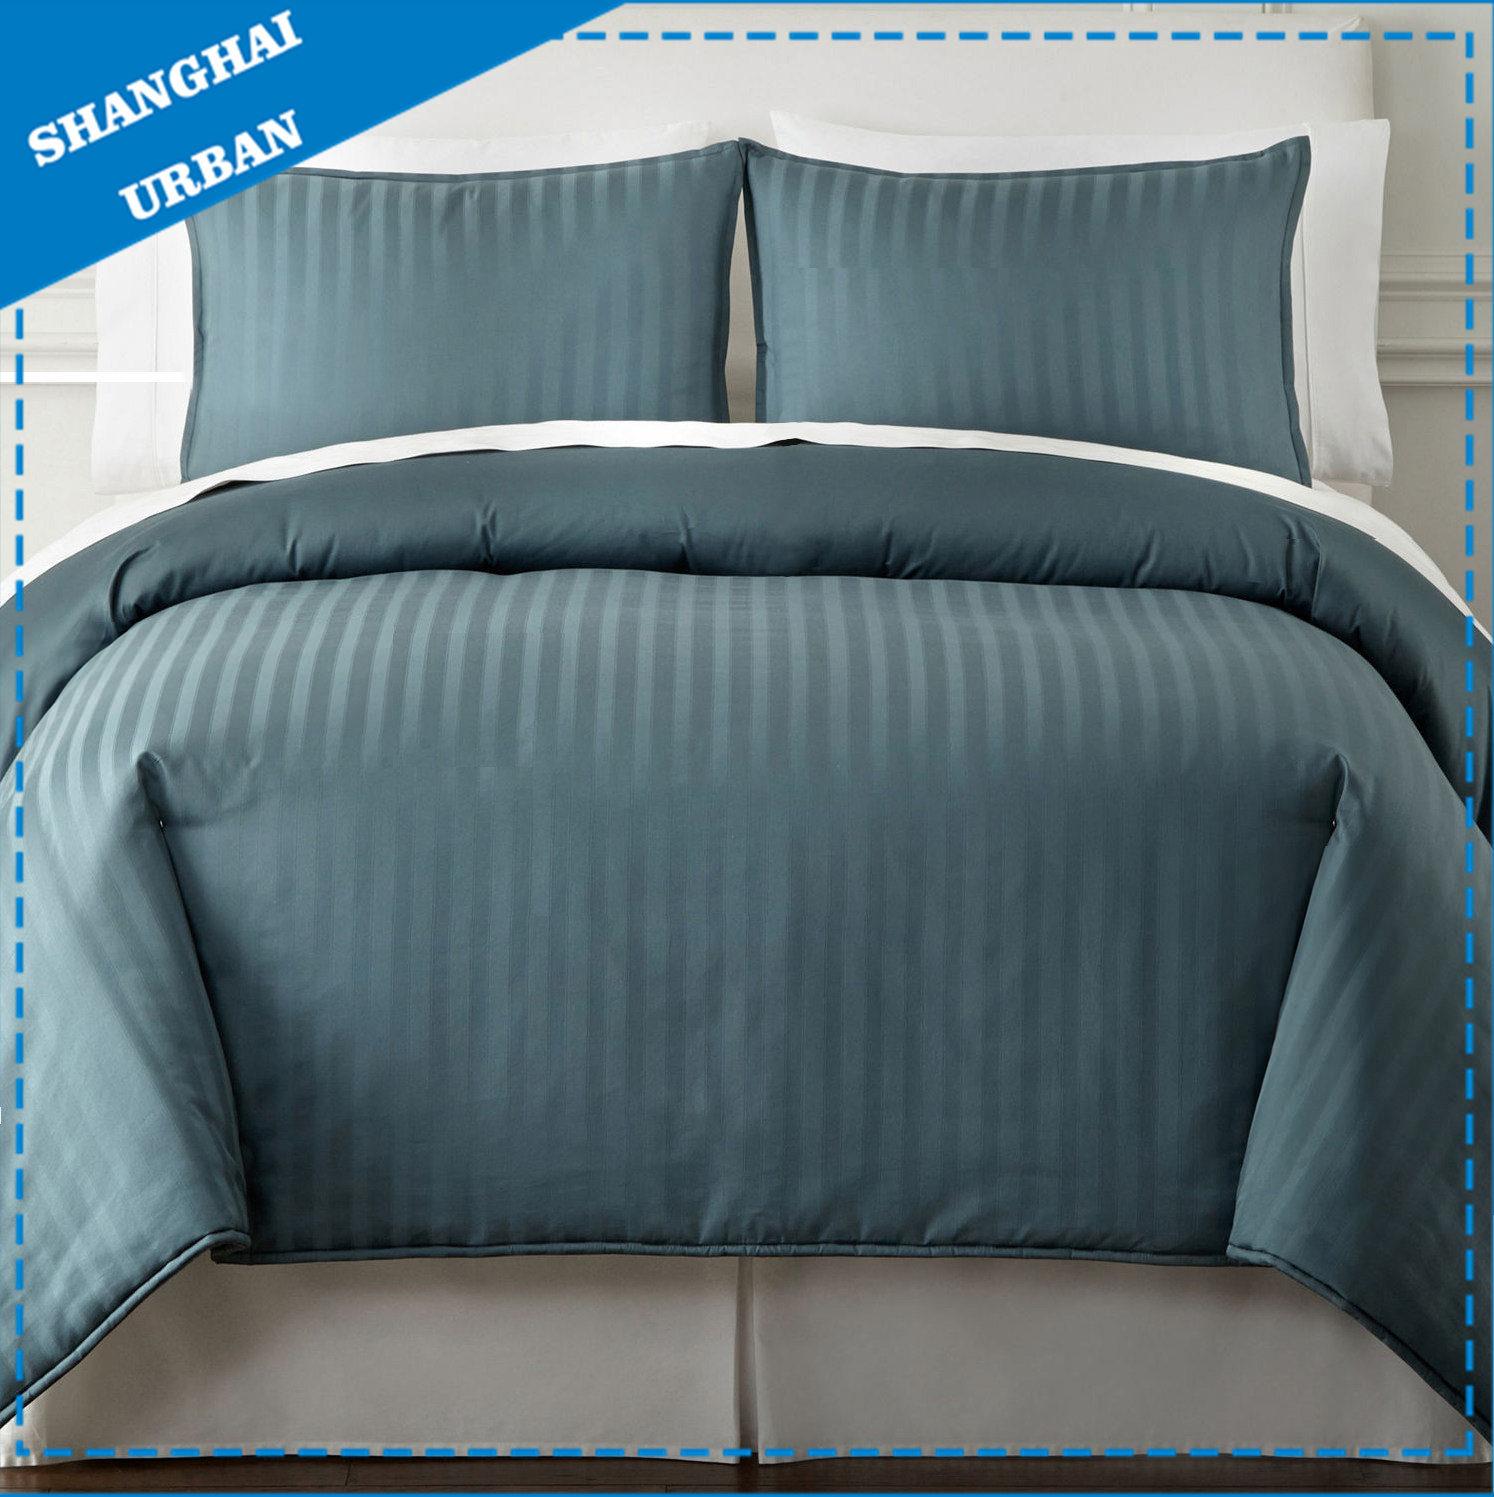 quilt sky scallop teal blue scalloped duvet of cover ideas light twin bedspread aqua solid